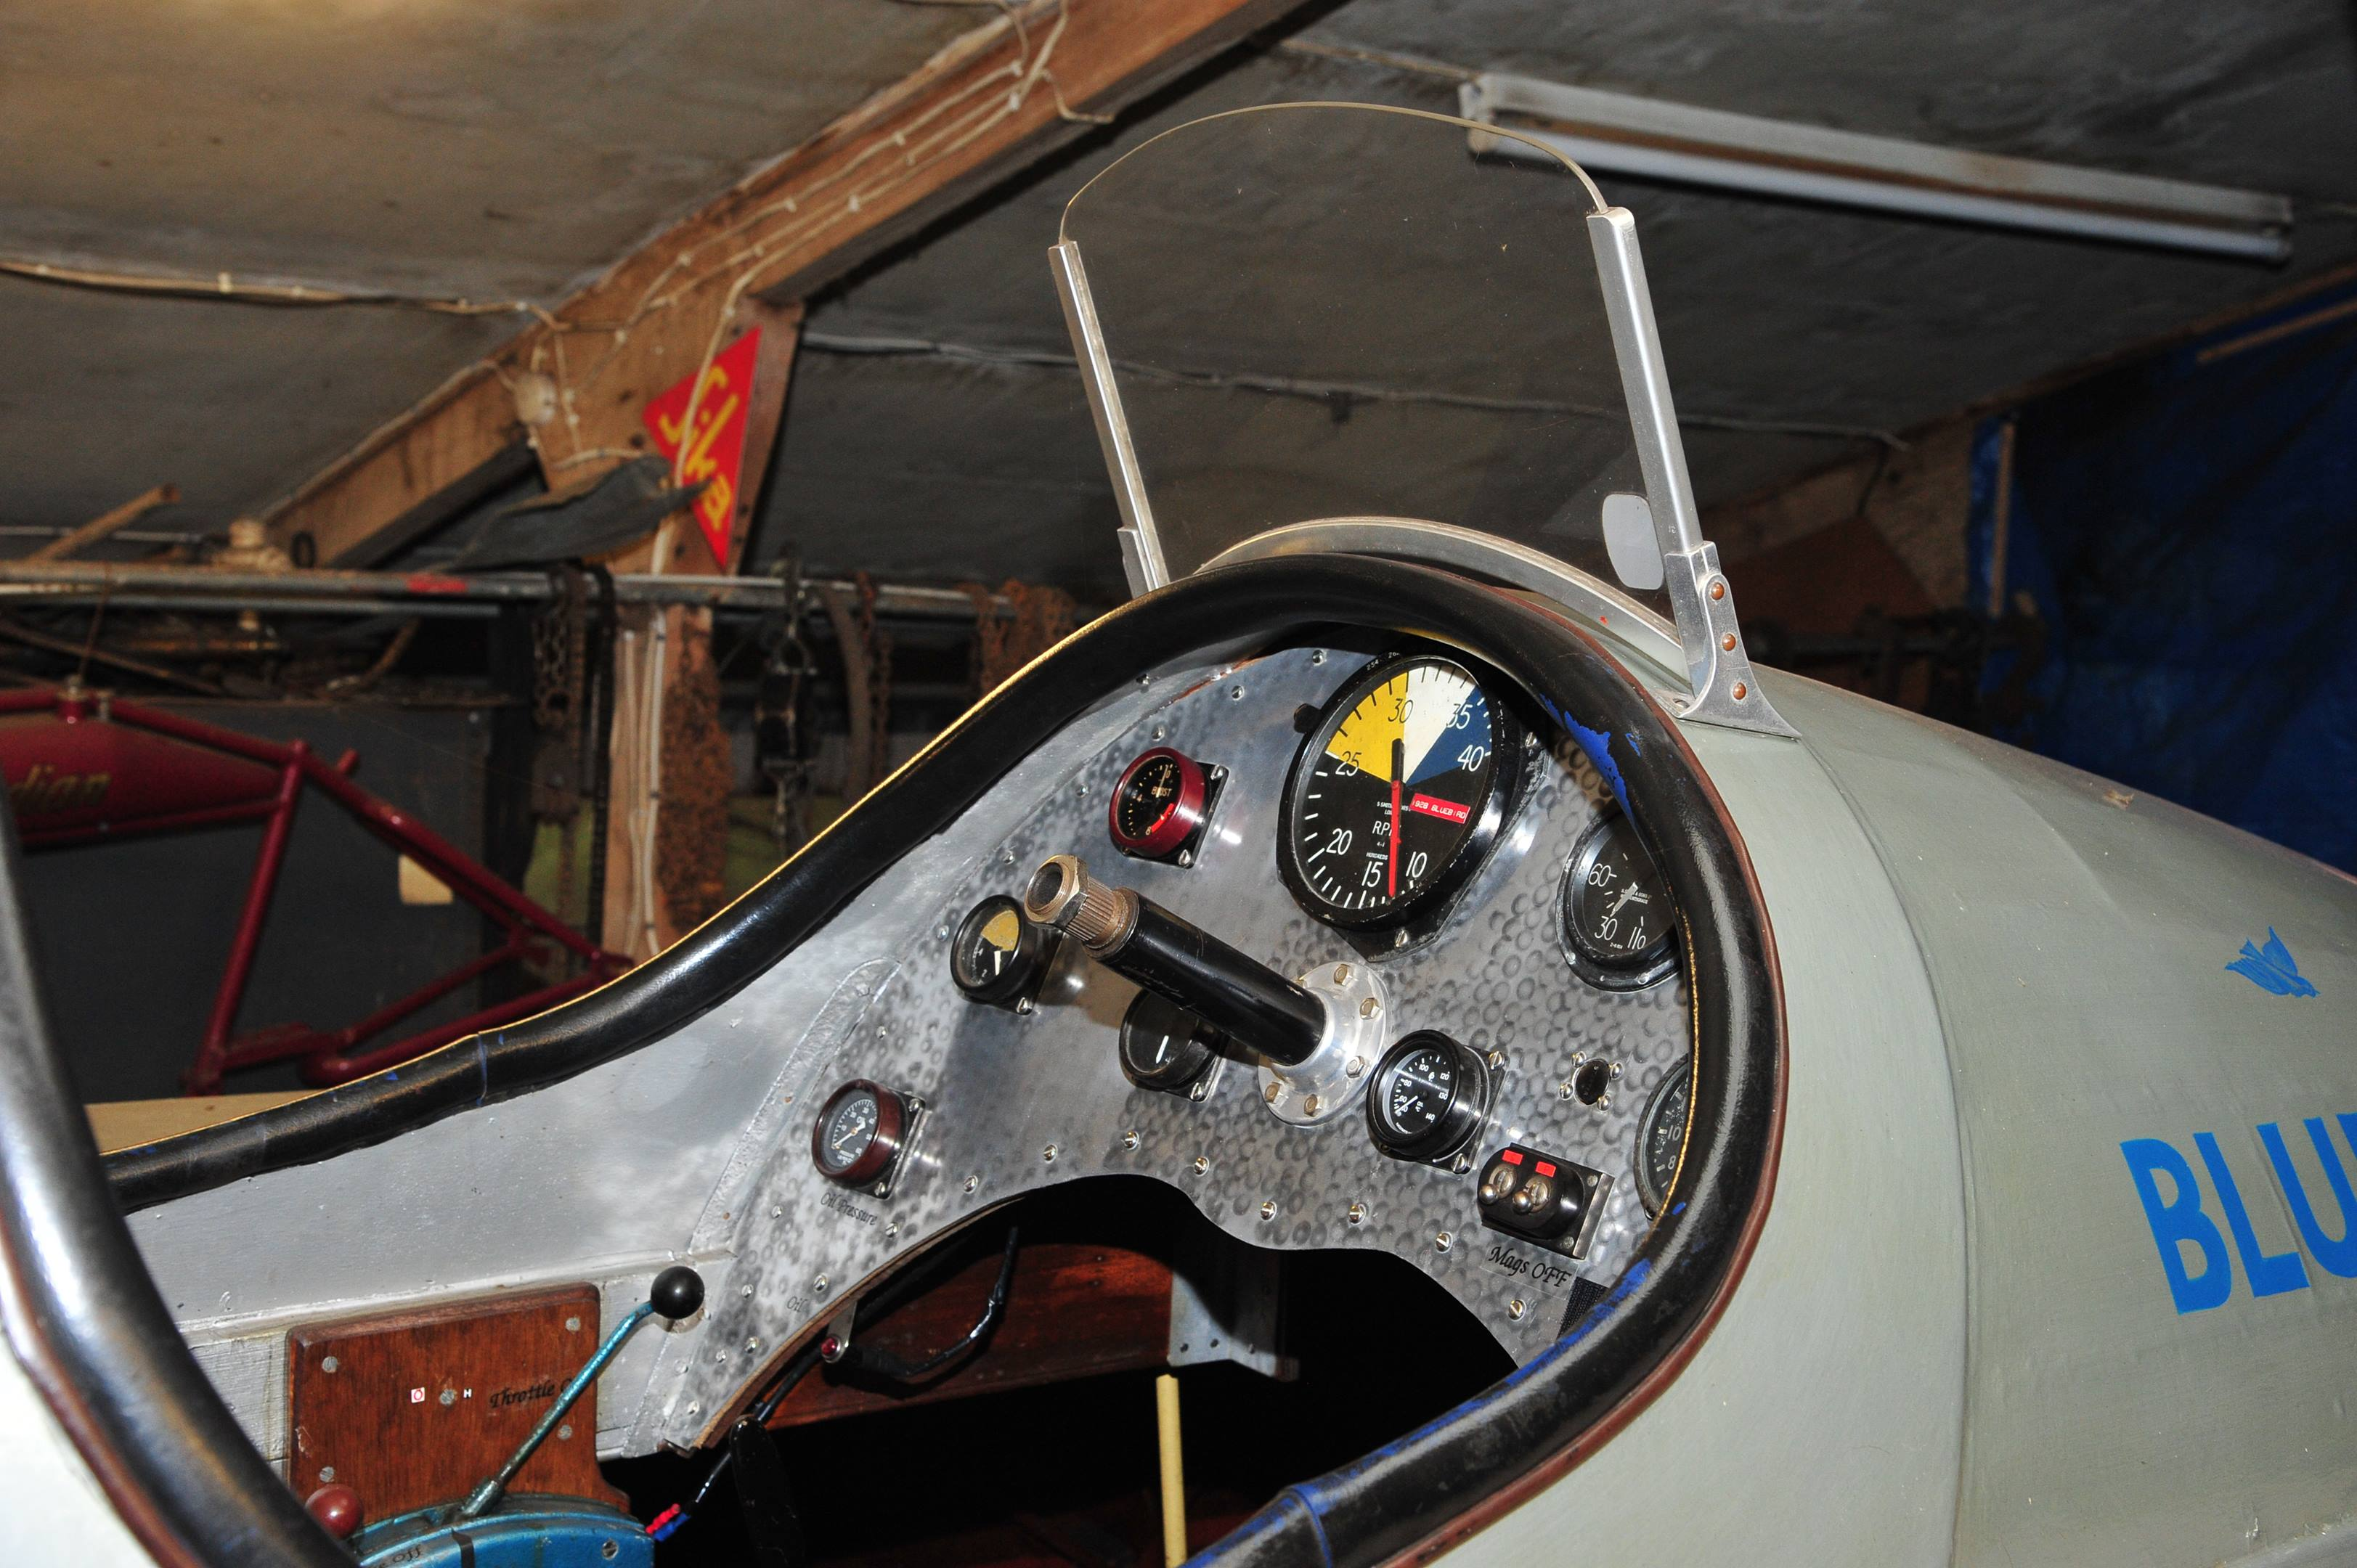 Blue Bird cockpit